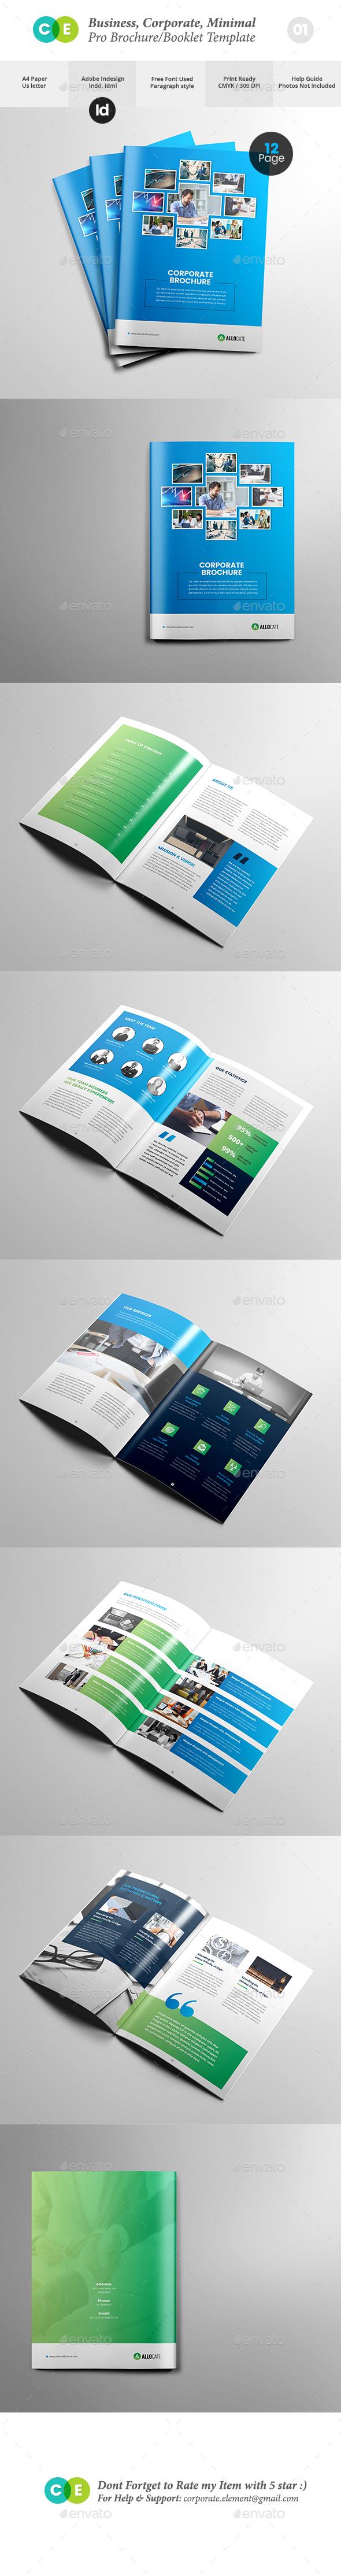 Business Clean Corporate Pro Brochure V01 - Brochures Print Templates